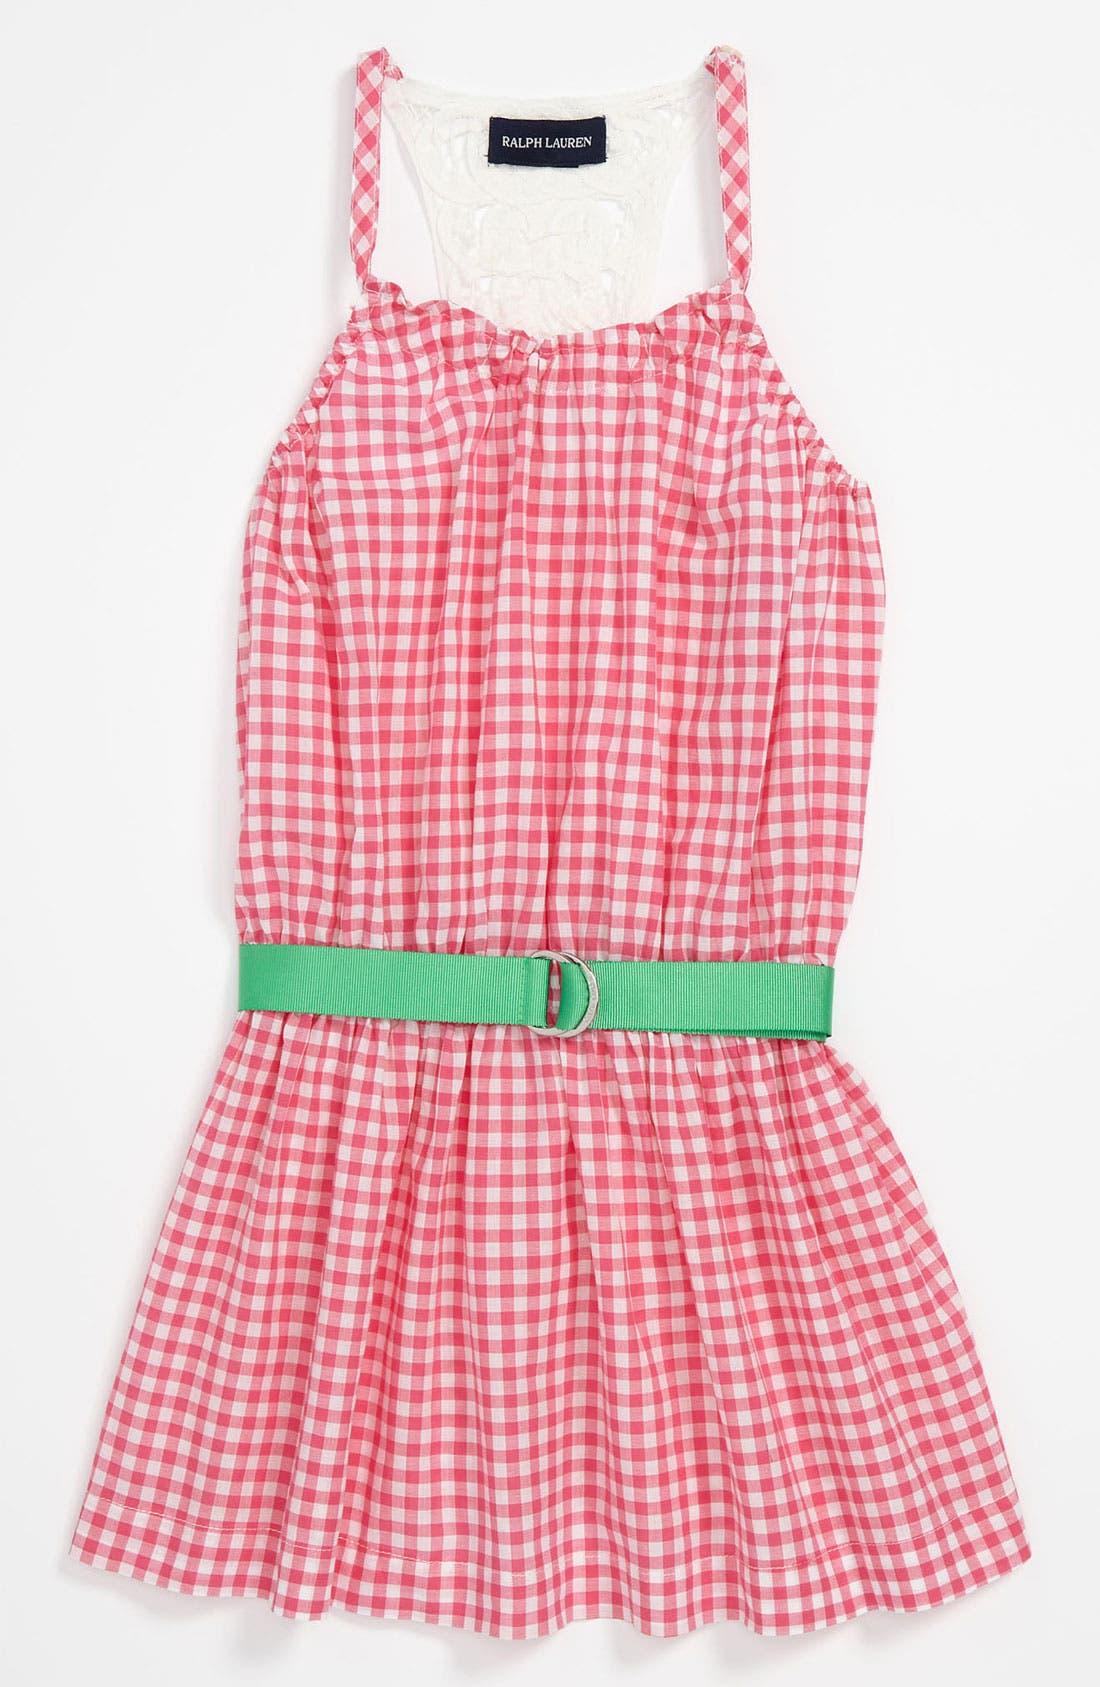 Main Image - Ralph Lauren Gingham Dress (Toddler)